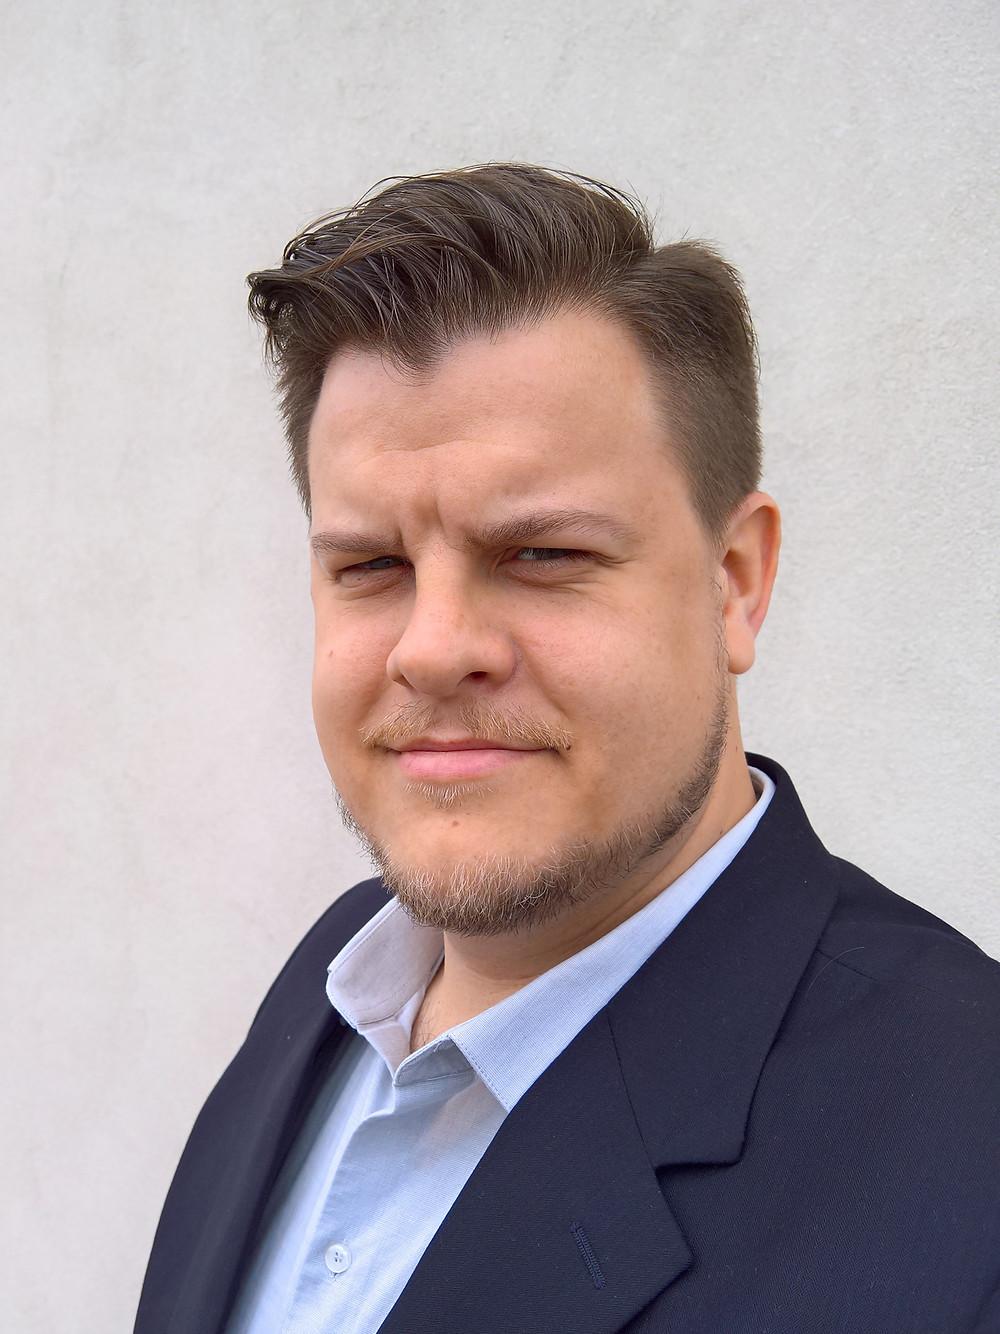 Jarkko Wickström, COO da Universidade da Finlândia